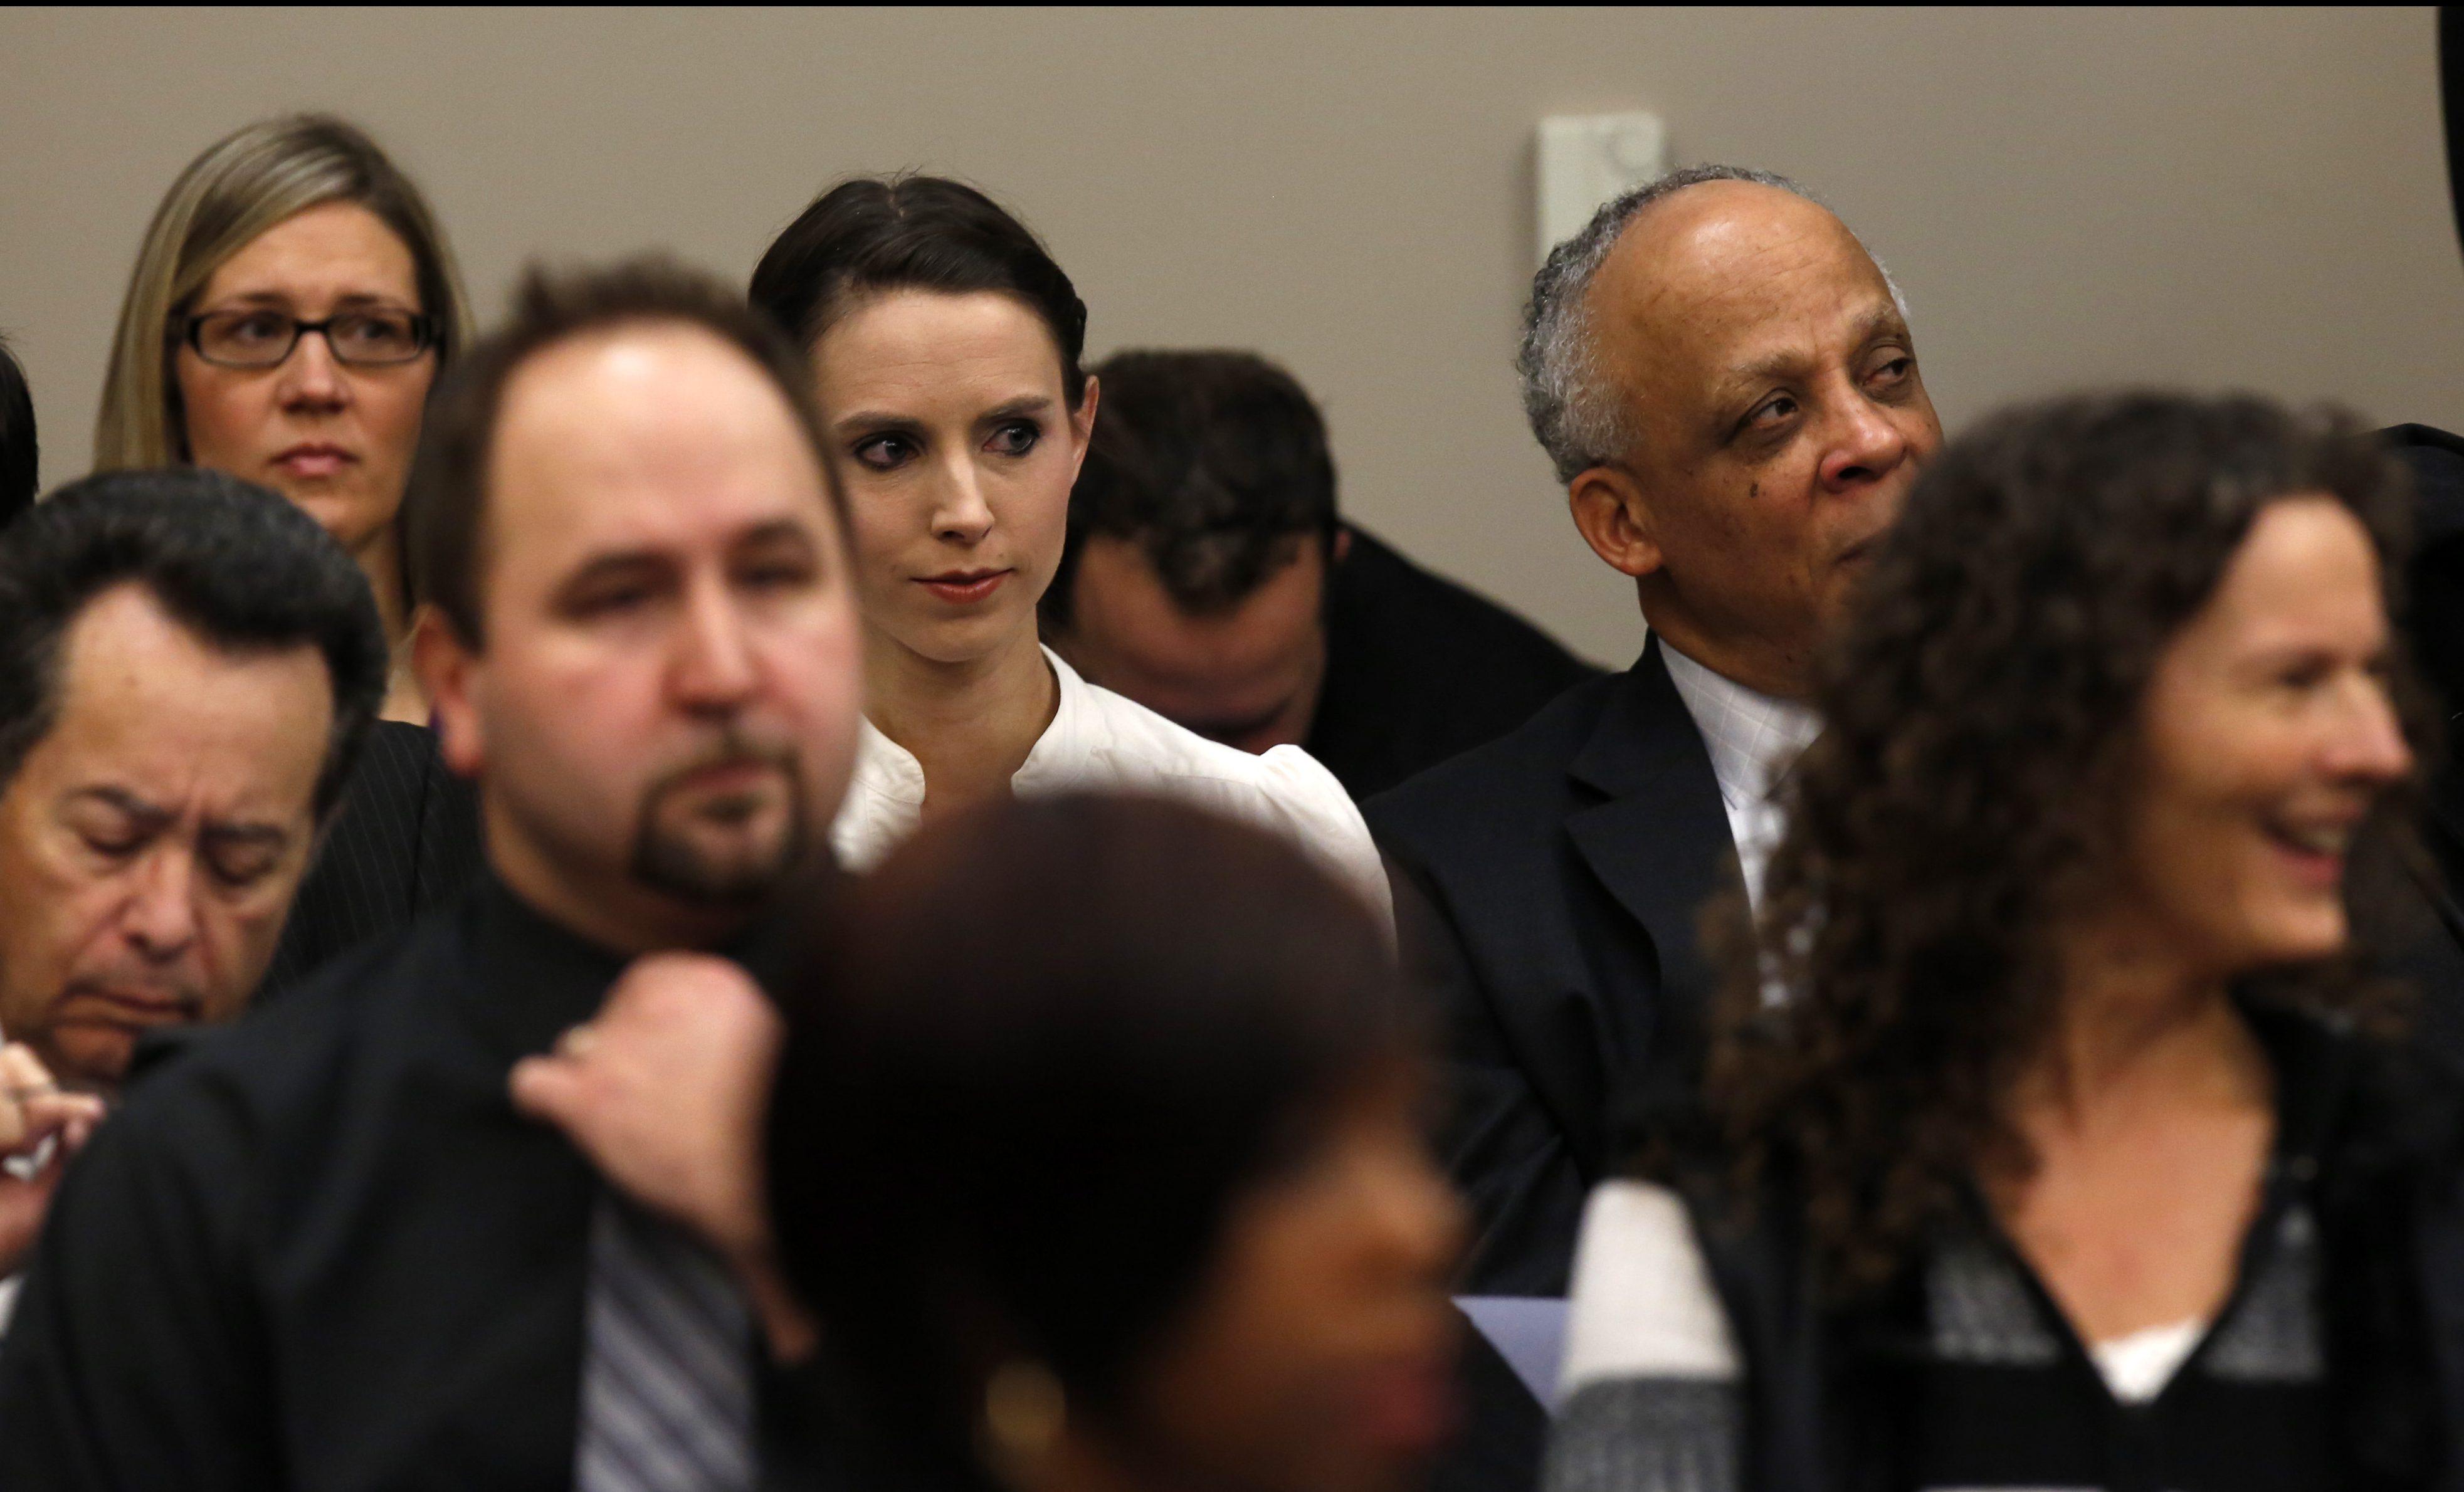 Rachael Denhollander, Larry Nassar hearing, sentencing, trial, courtroom, Michigan